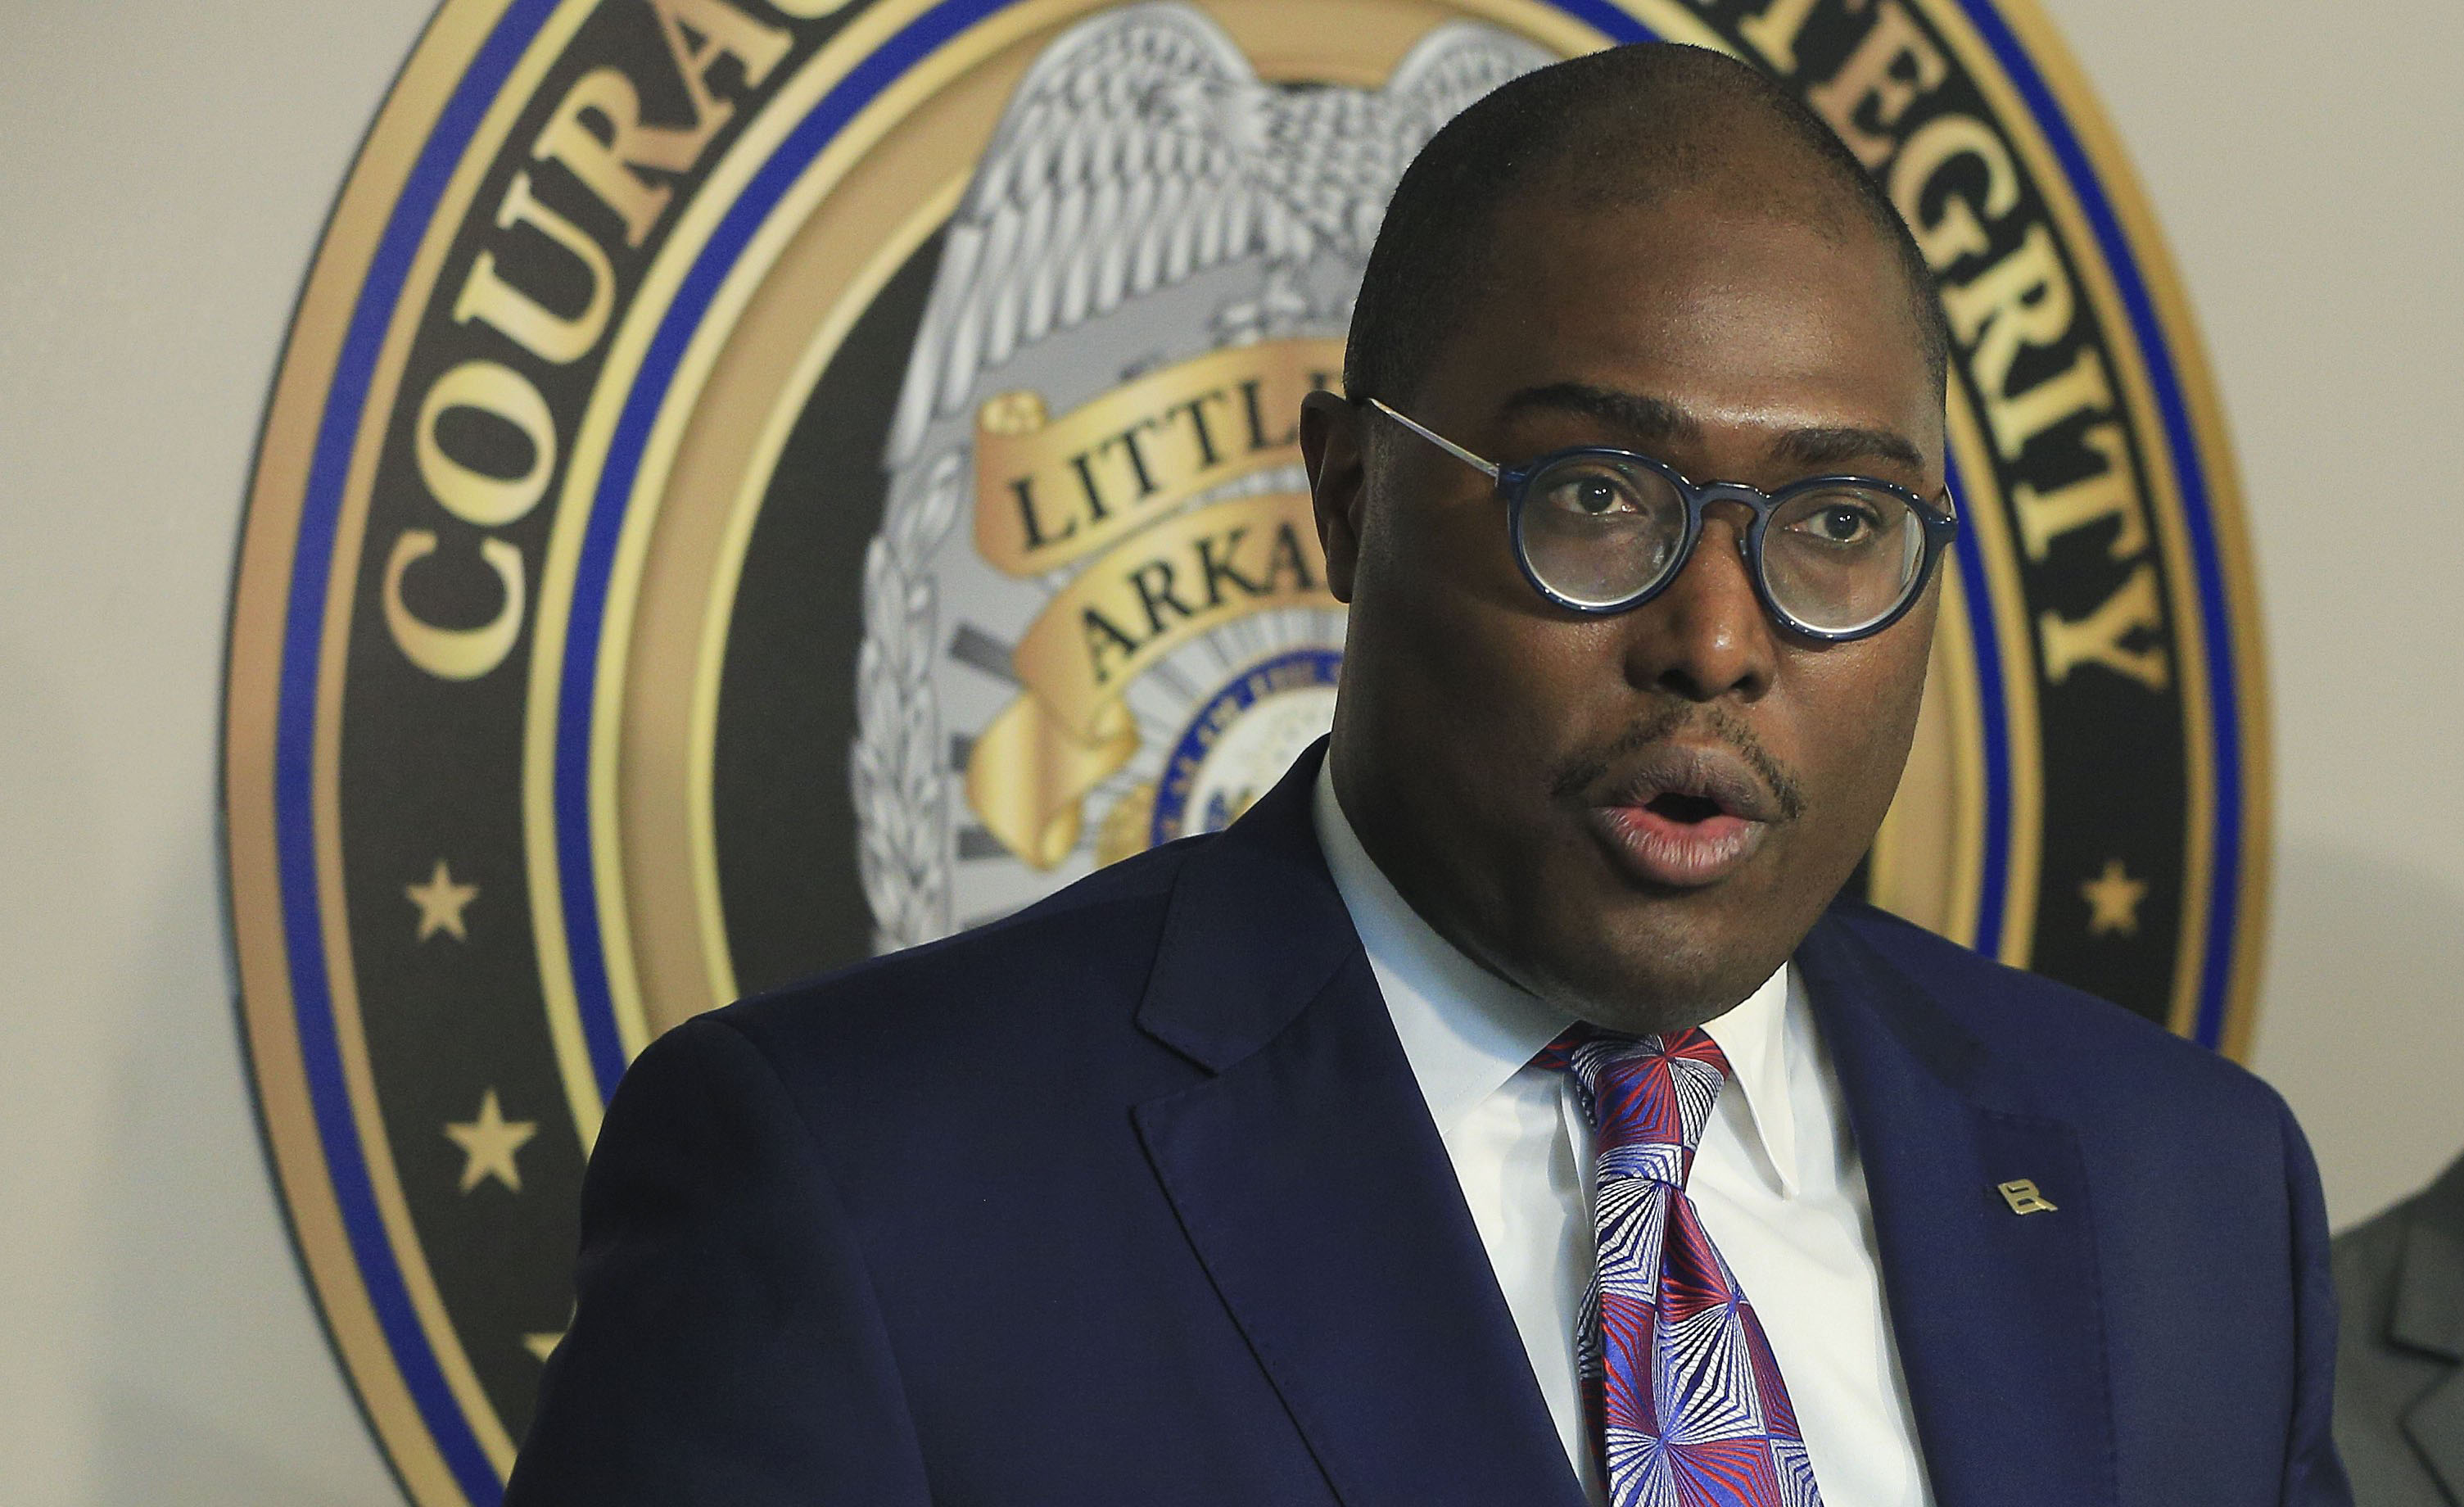 Little Rock's 2020 budget needs public input, time, mayor says